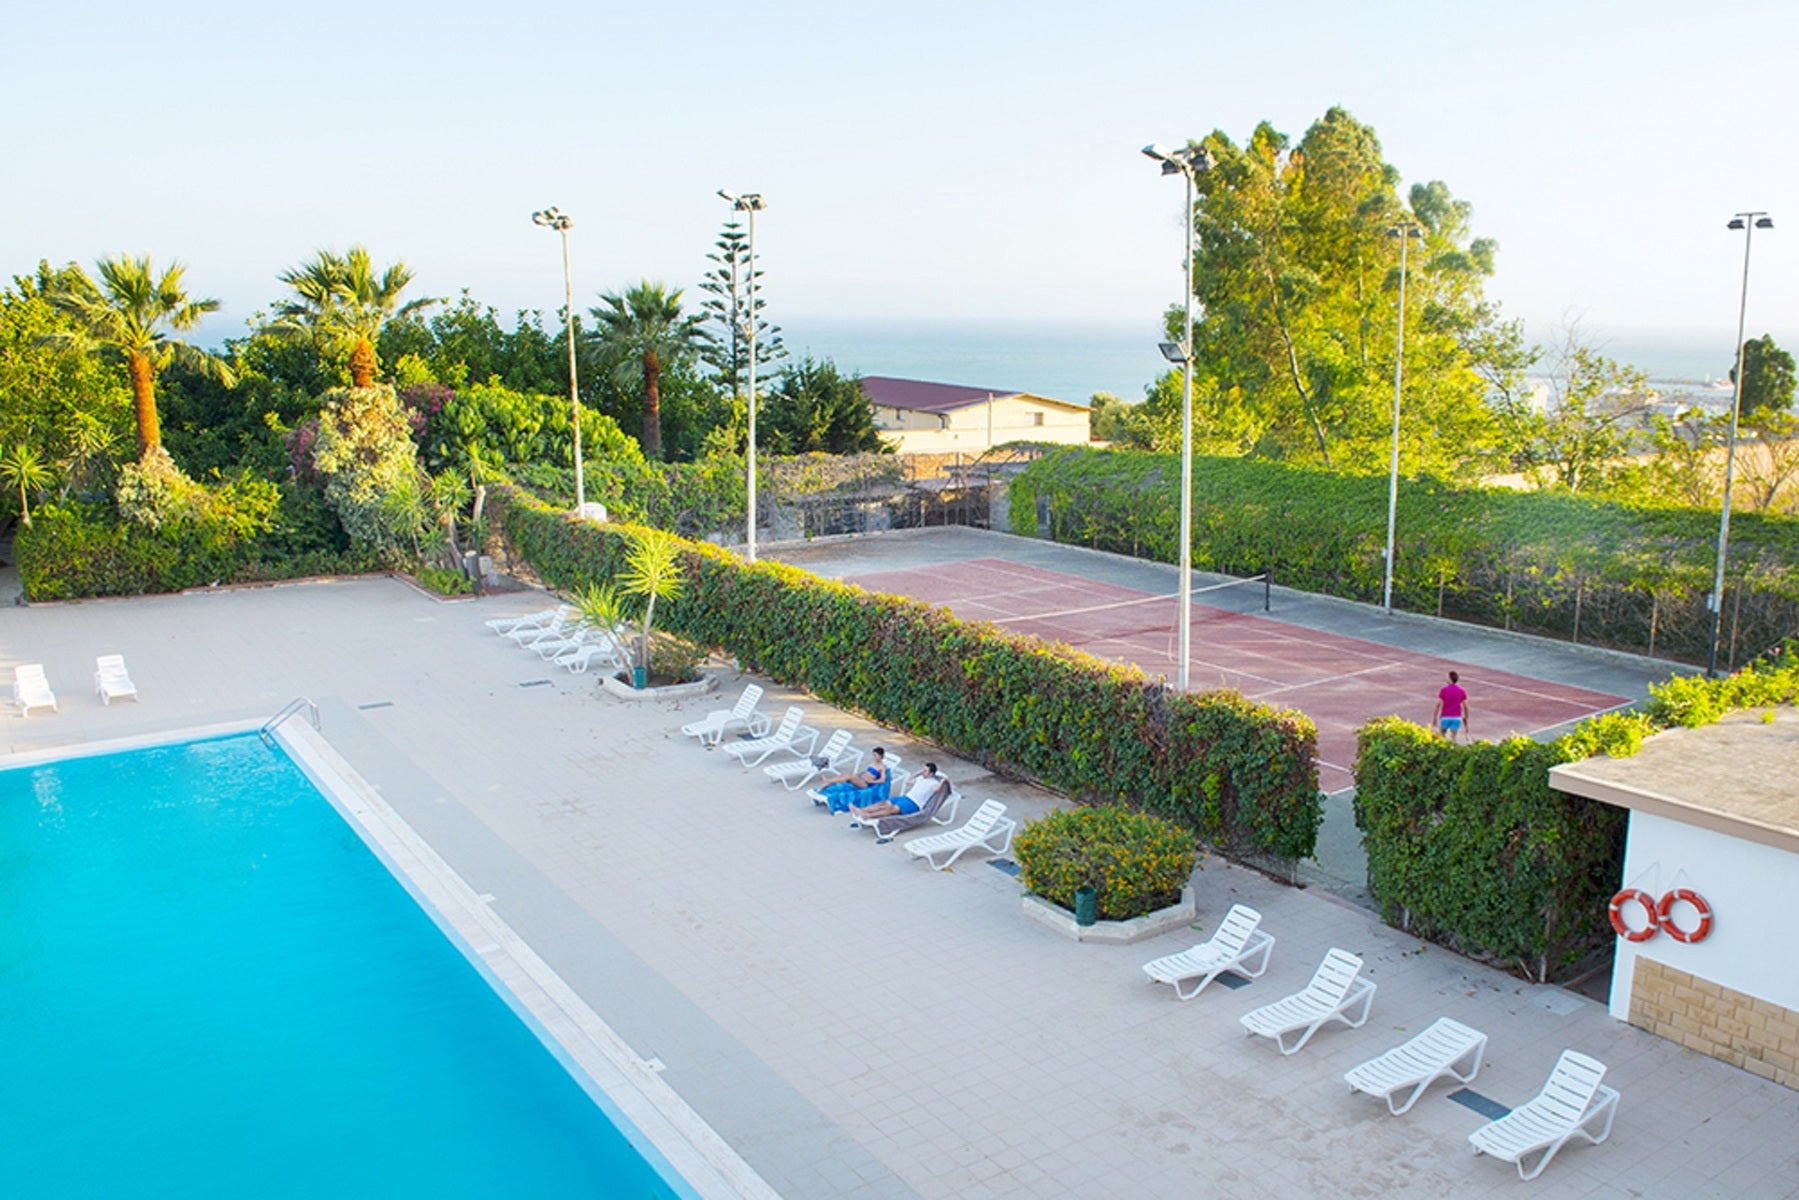 Dei Pini in Agrigento, Italy | Holidays from £189pp | loveholidays